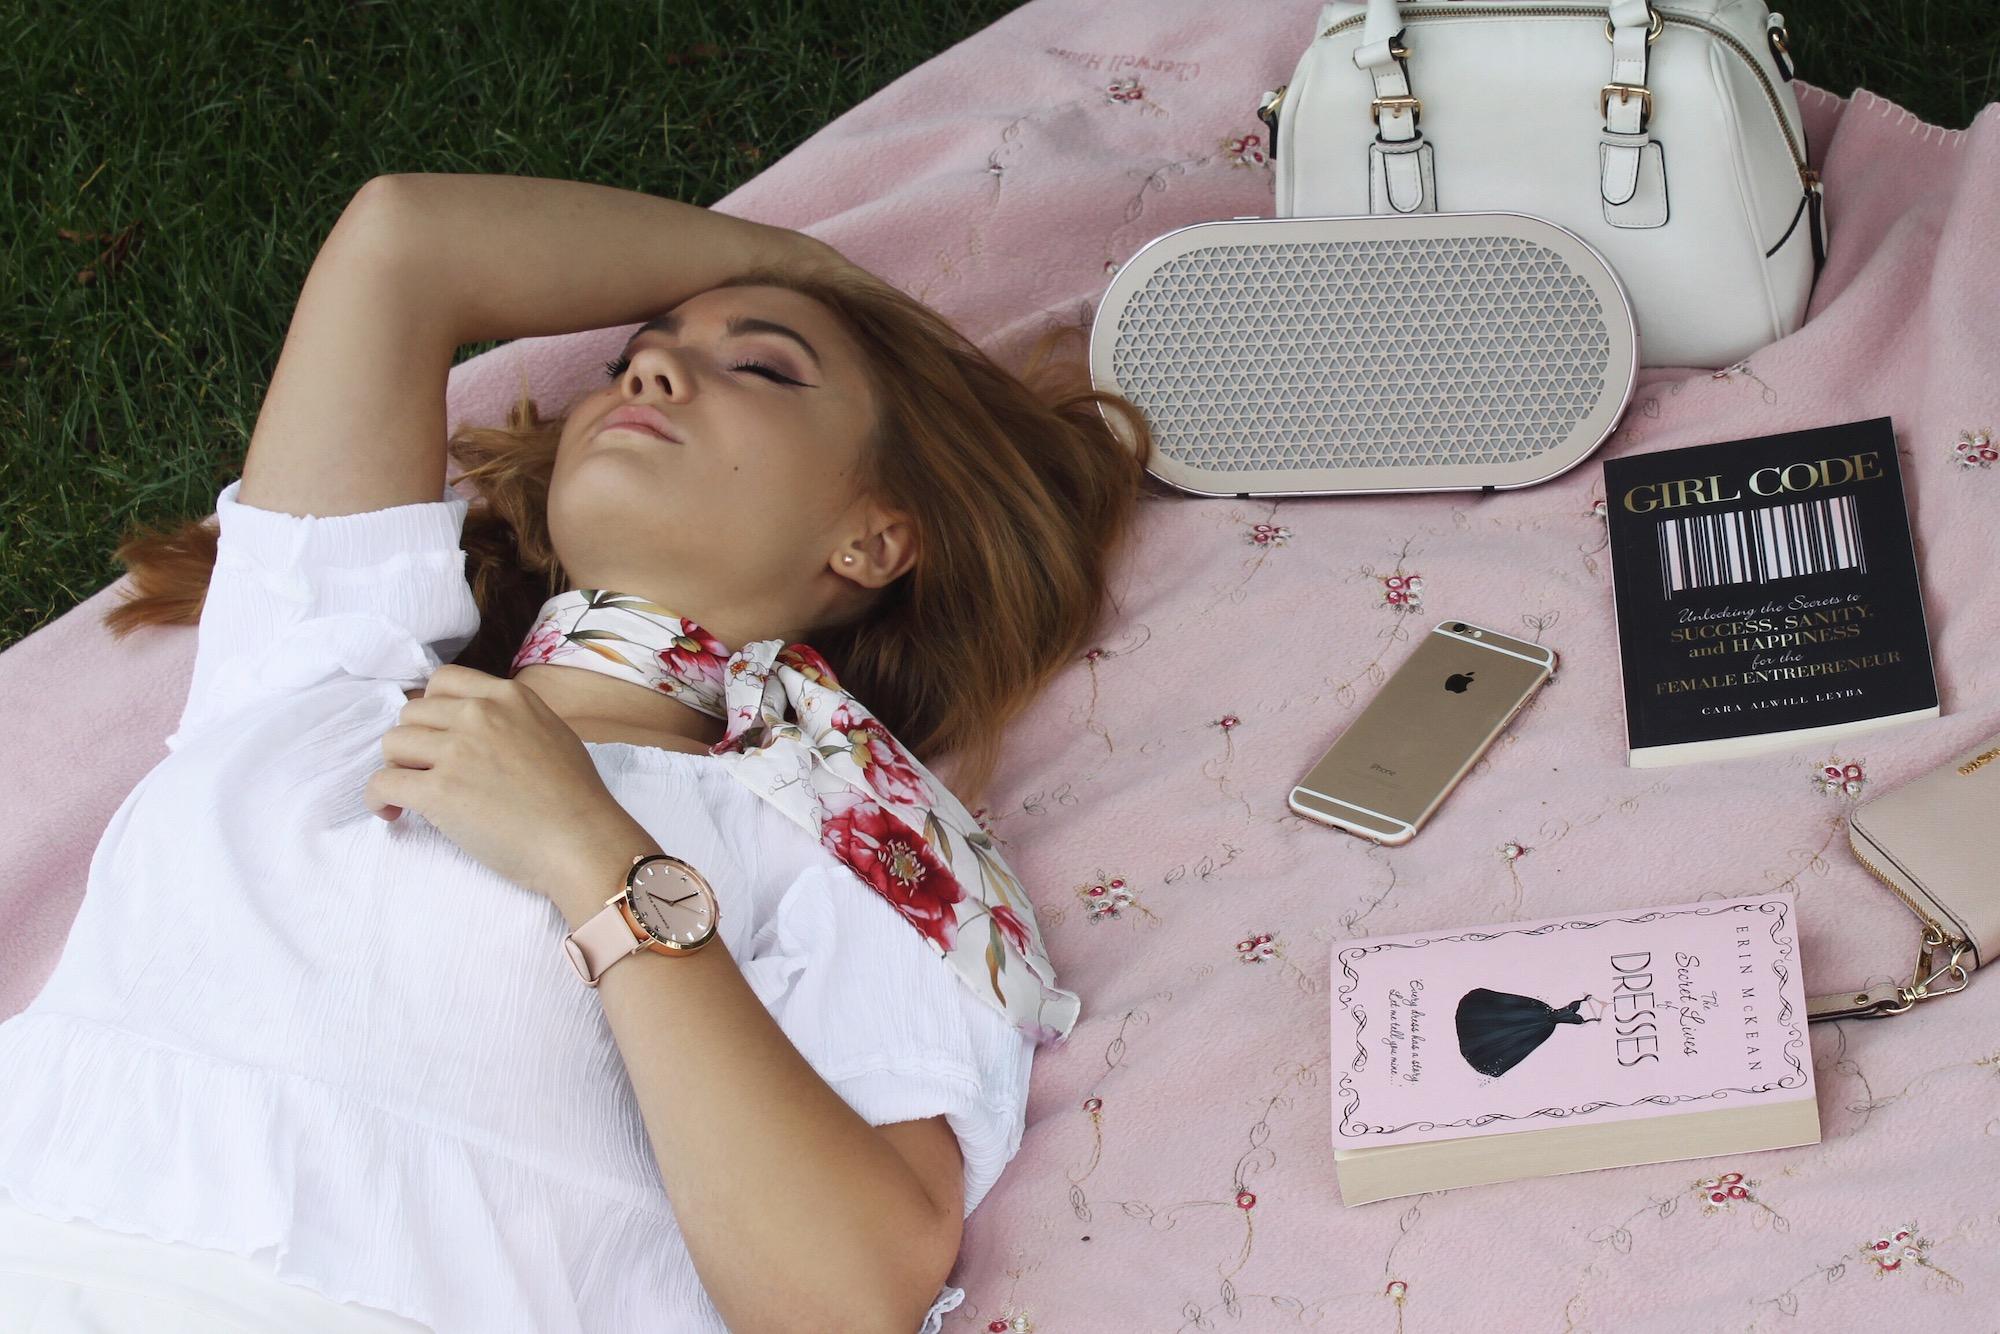 juliana-chow-dali-speakers-play-katch-campaign-instagram-social-technology-fashion-copenhagen-london-blog-blogger10